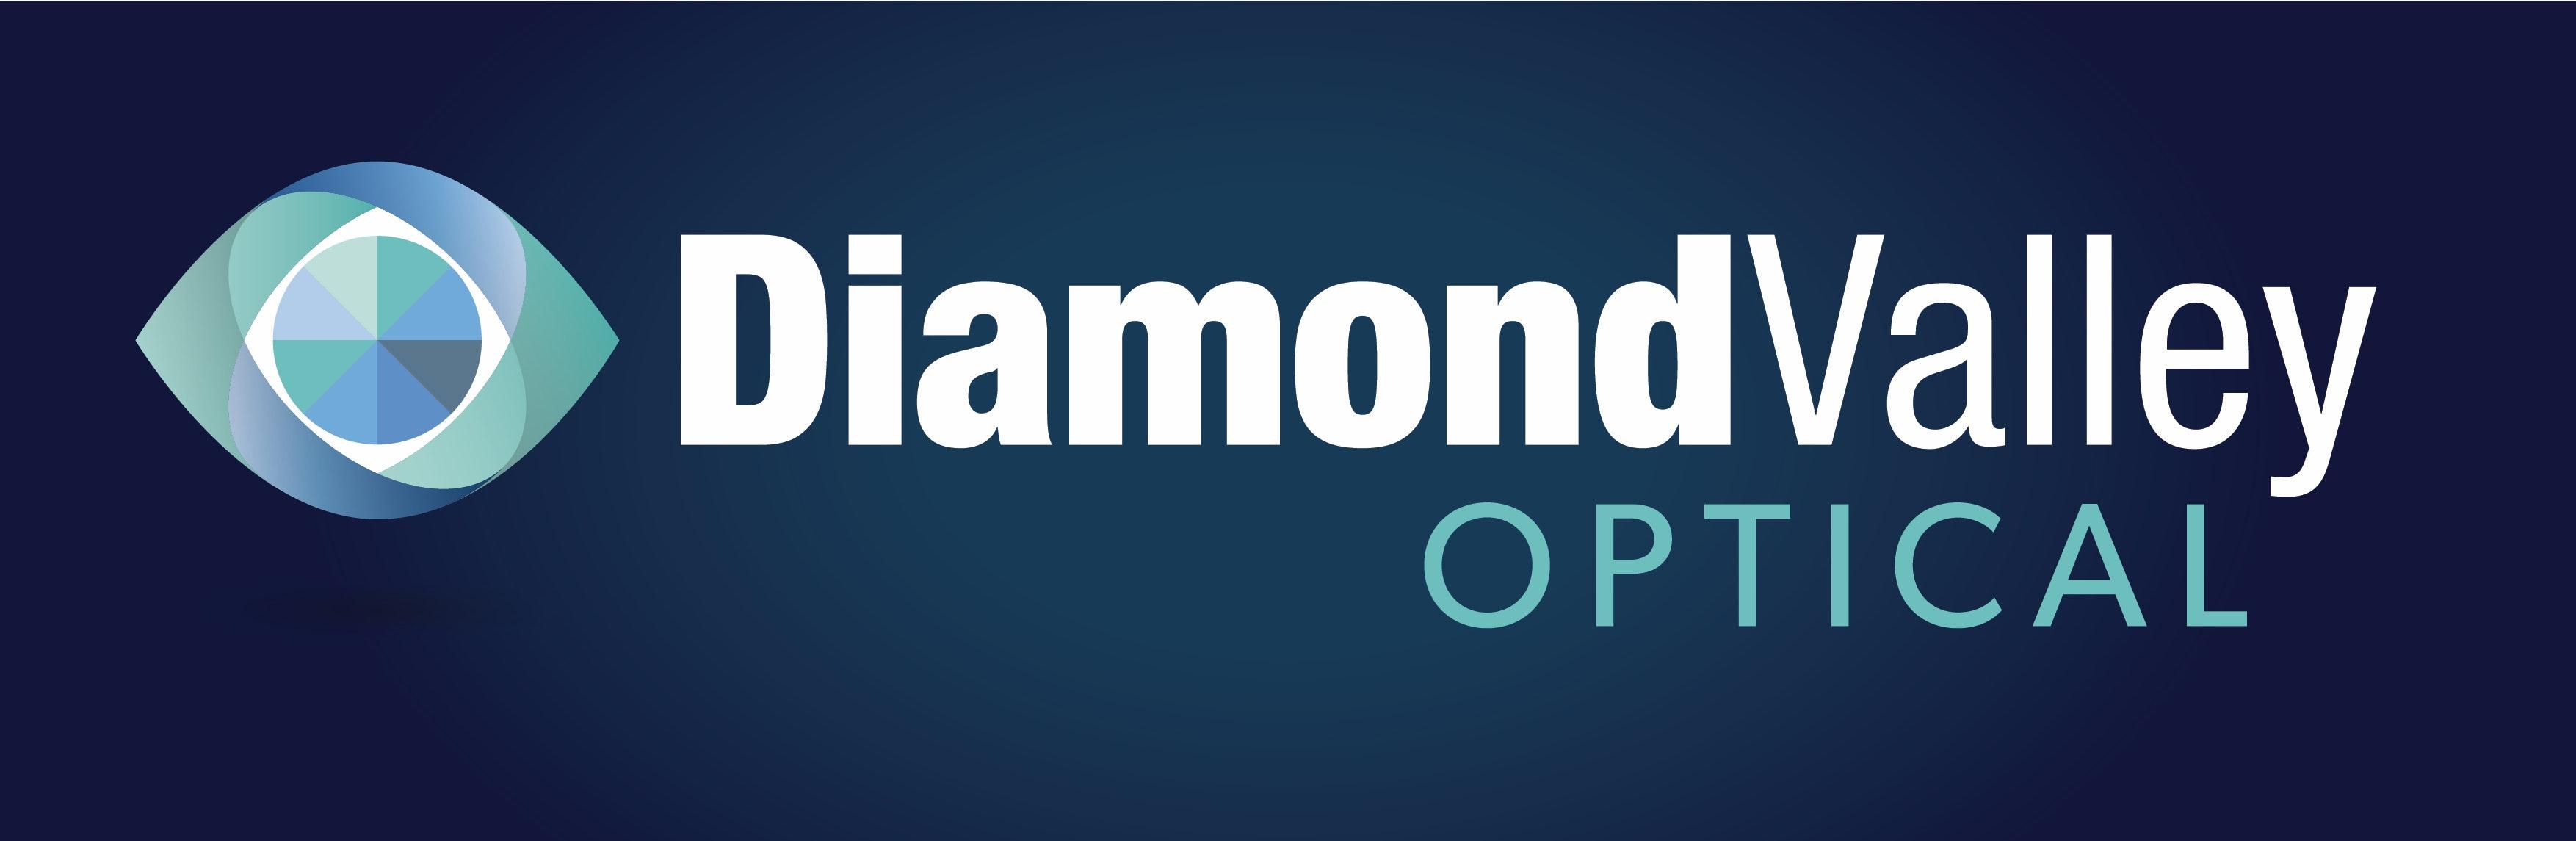 logo for Diamond Valley Optical Optometrists